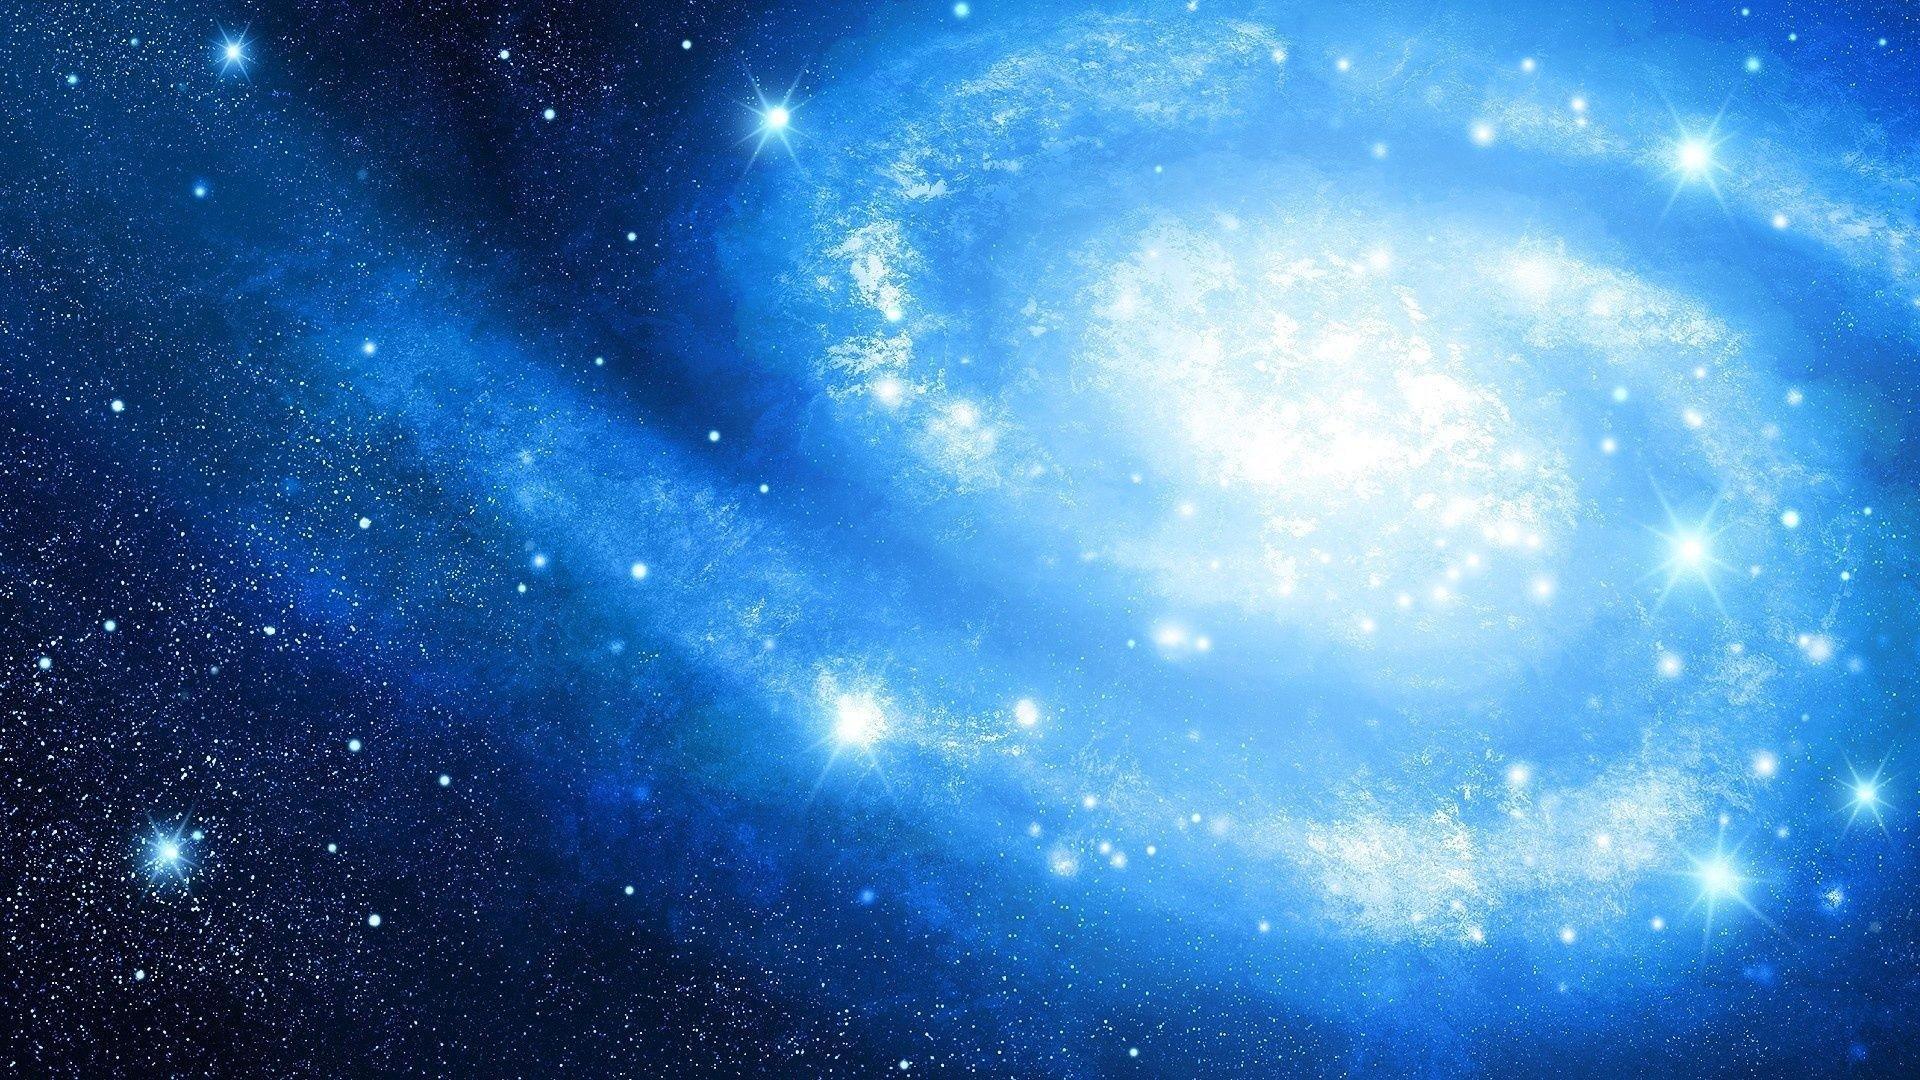 Stars Wallpaper Picture hd